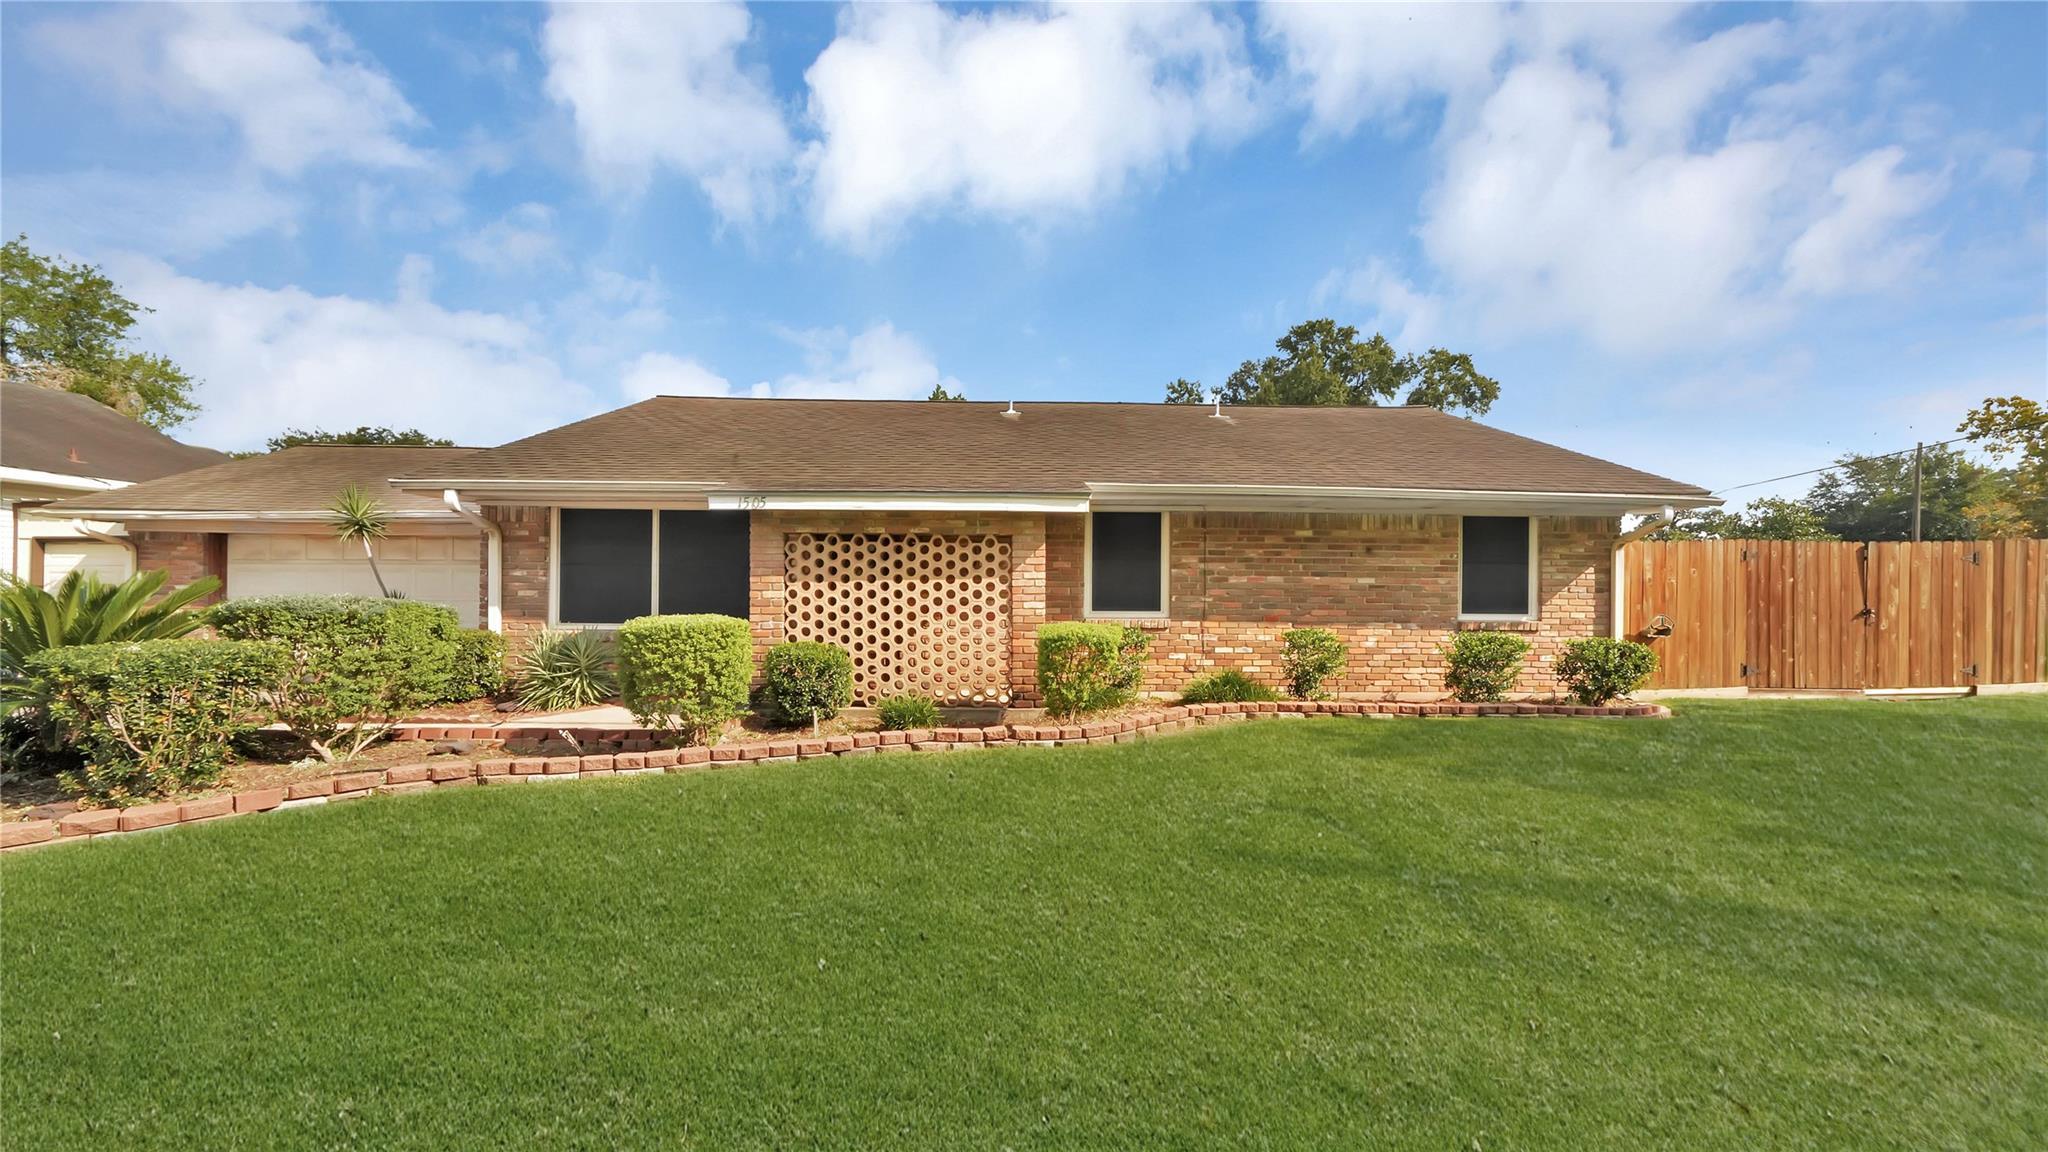 1505 5th Street Property Photo - Galena Park, TX real estate listing